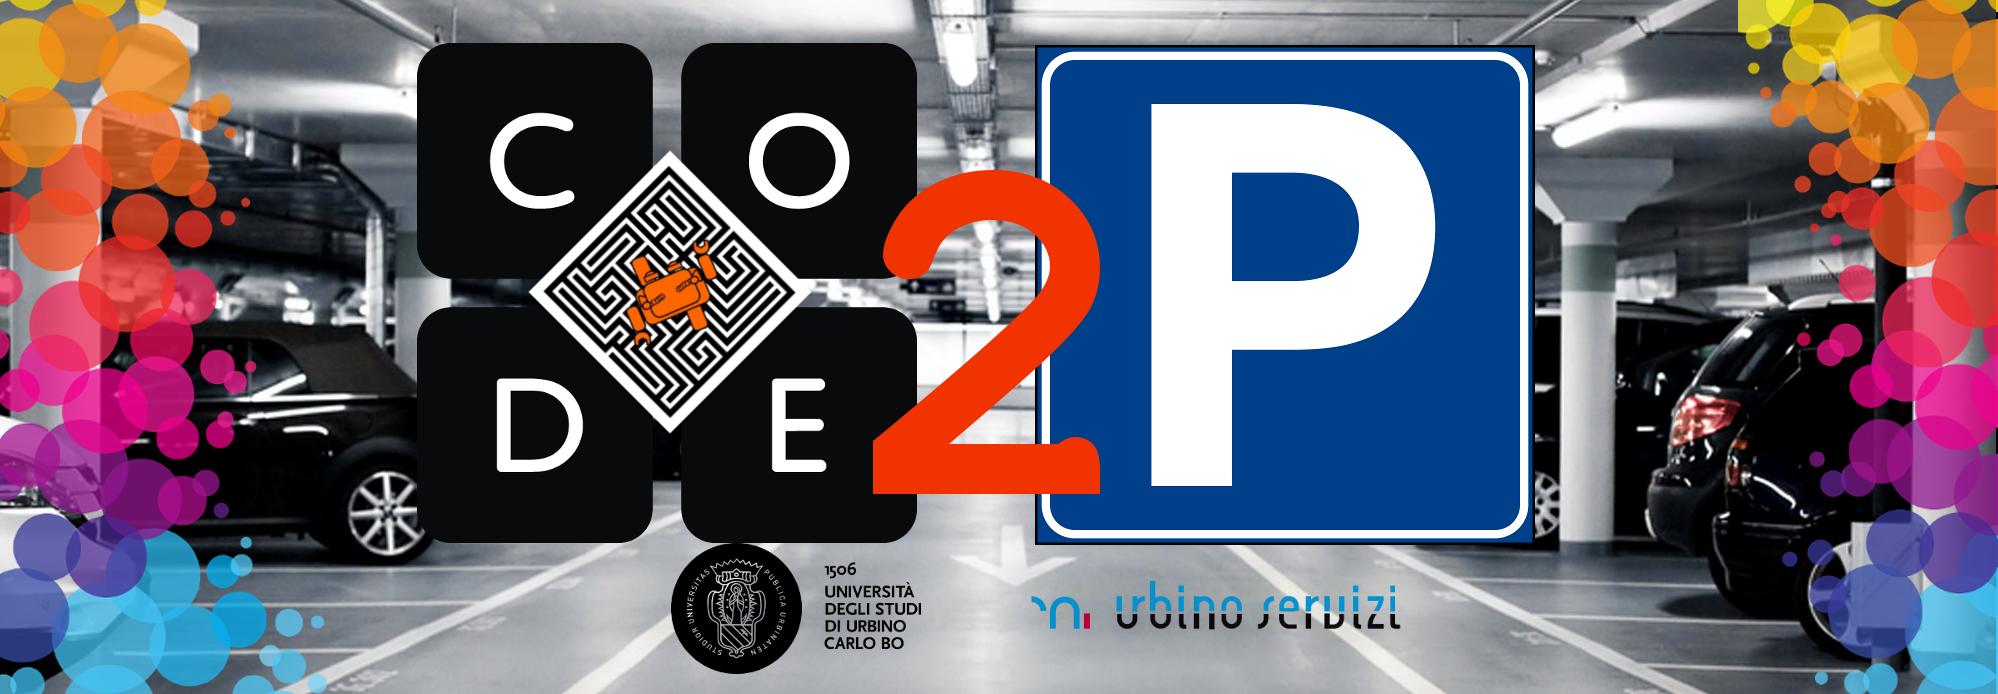 code2park